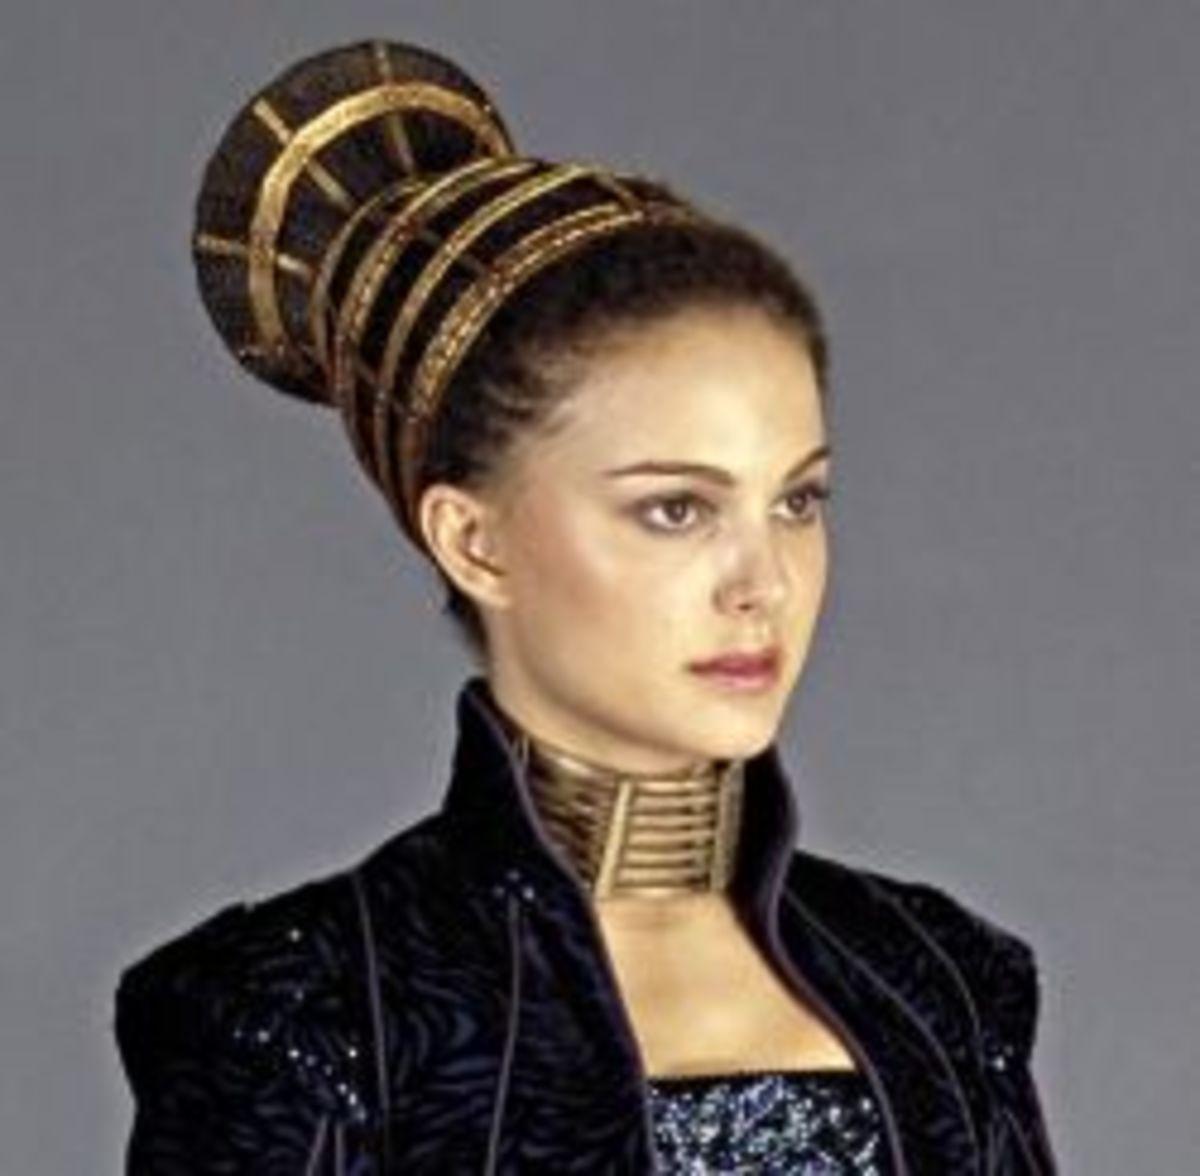 Natalie Portman as Padme Amidala from Star Wars Episode II